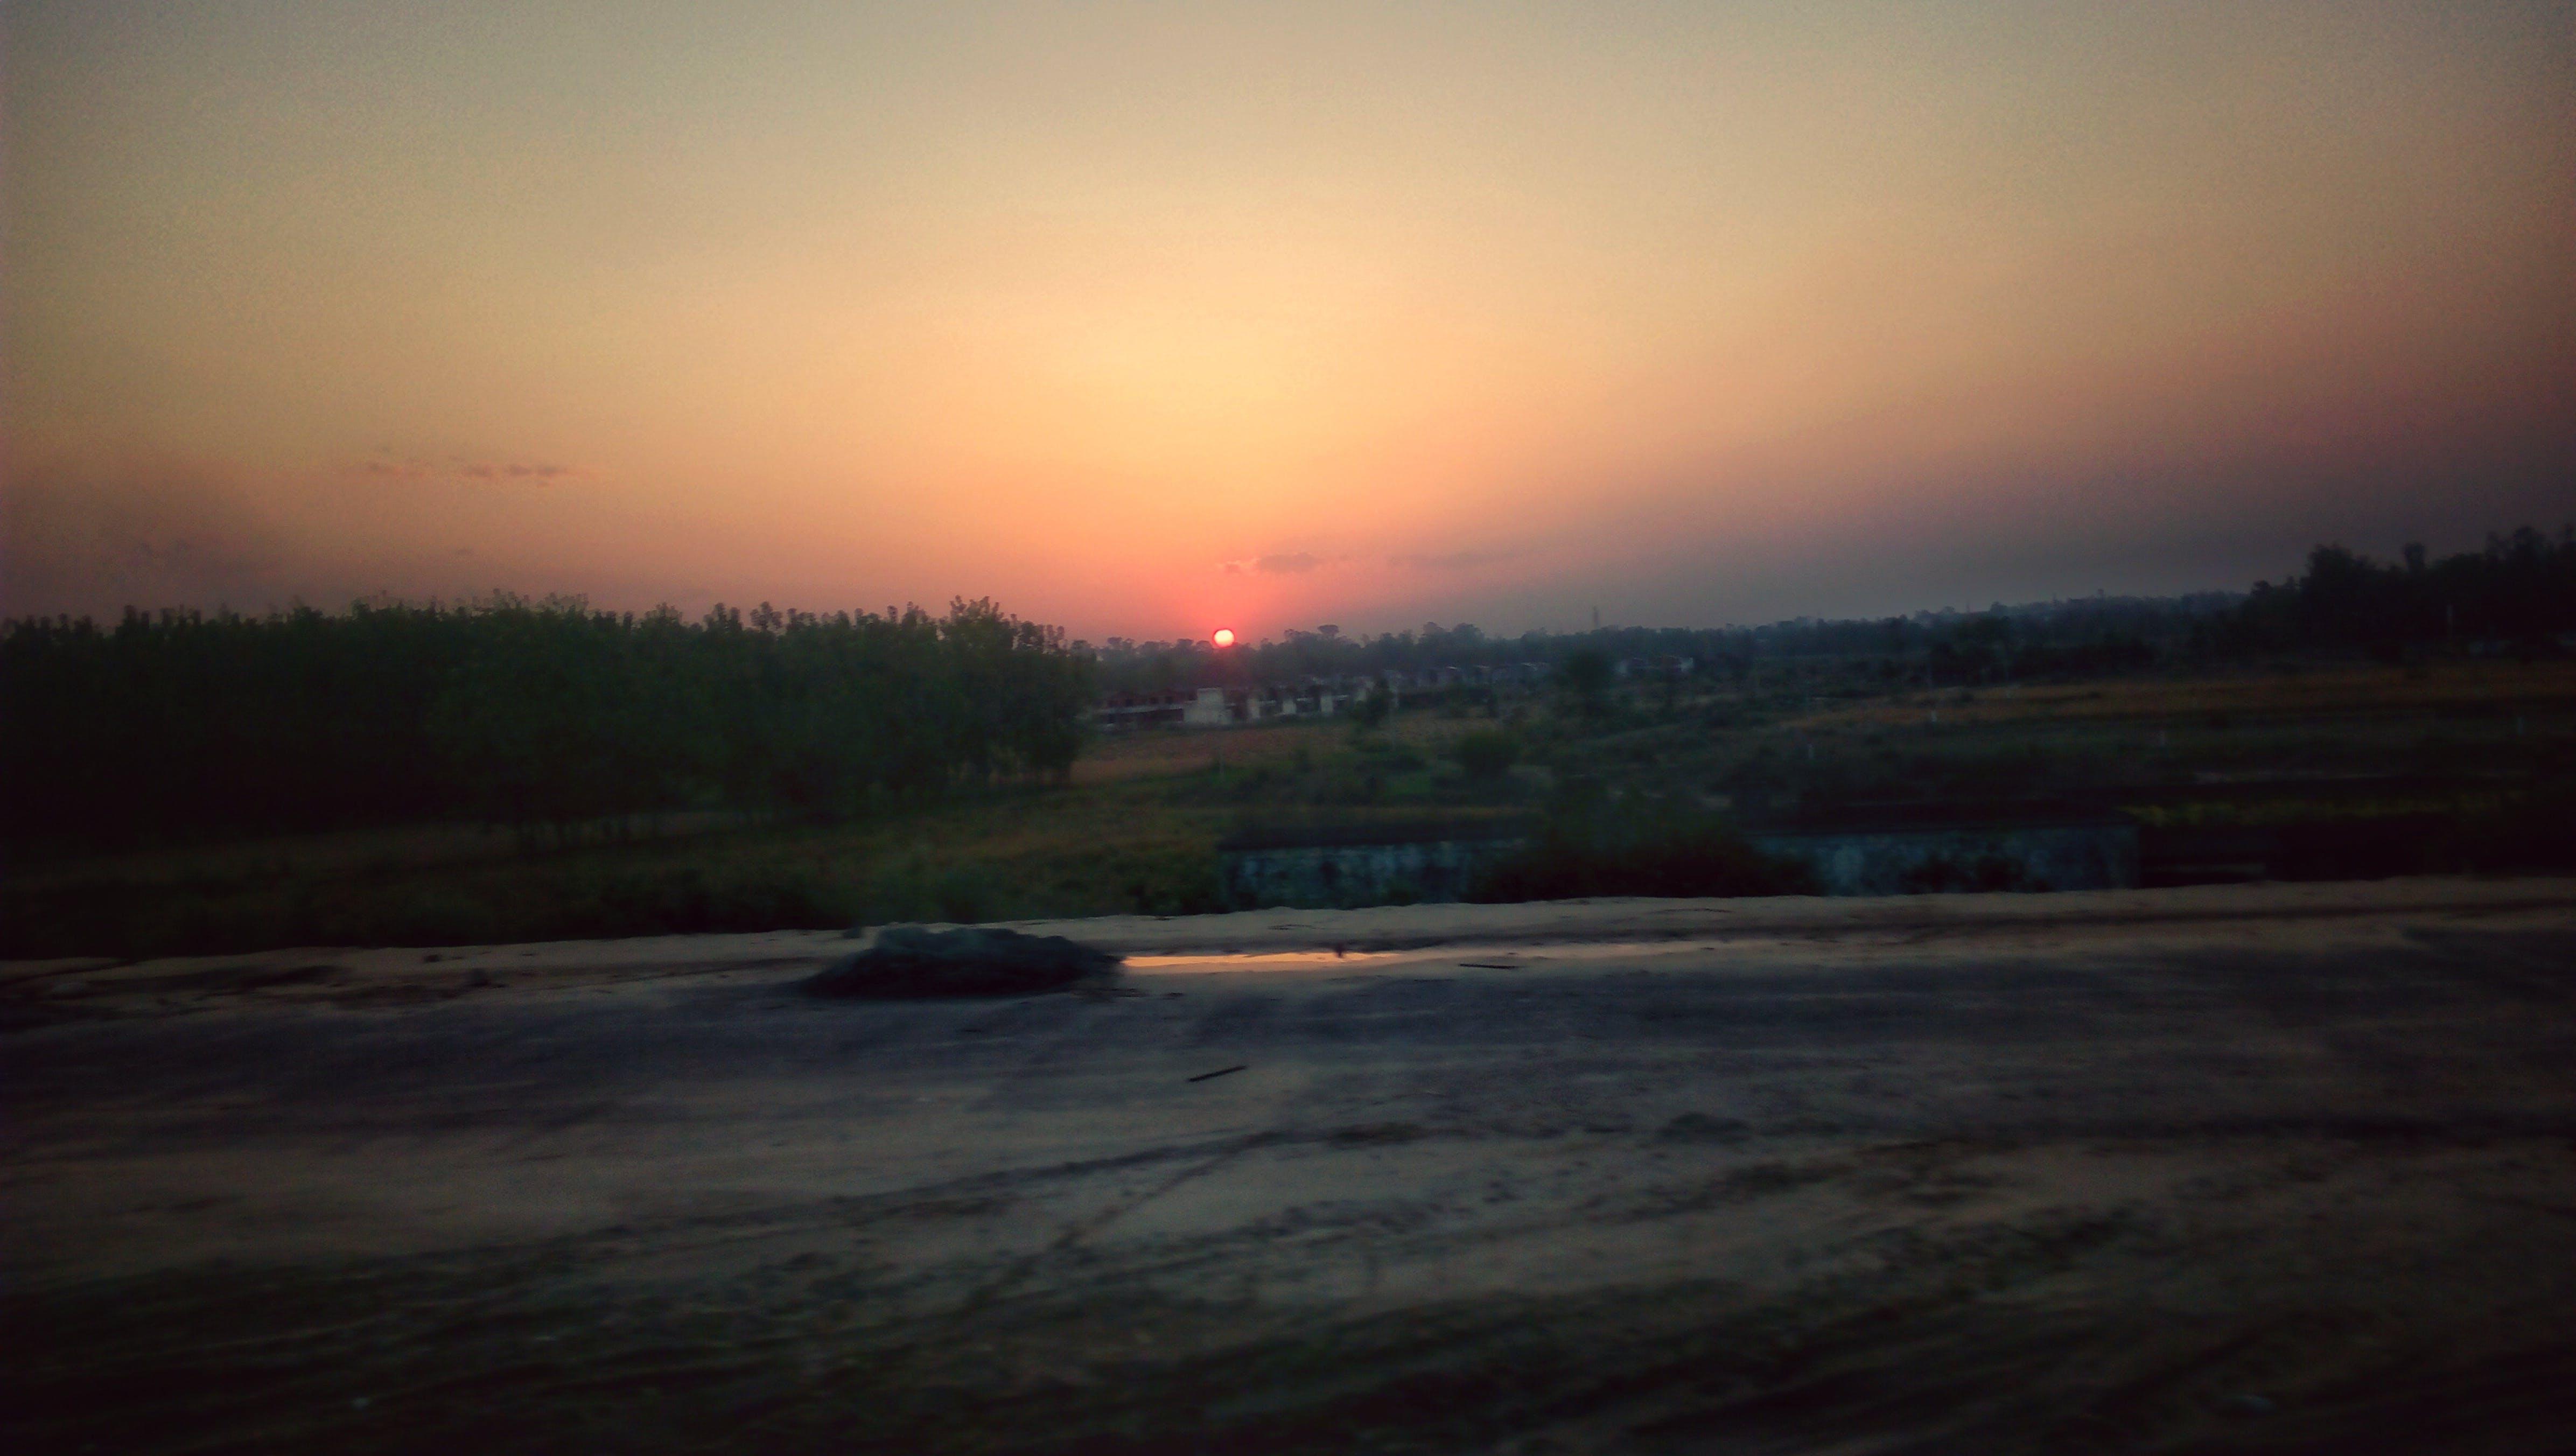 Free stock photo of #sunset_pics #sunsetsniper #sunset_stream #sunset_